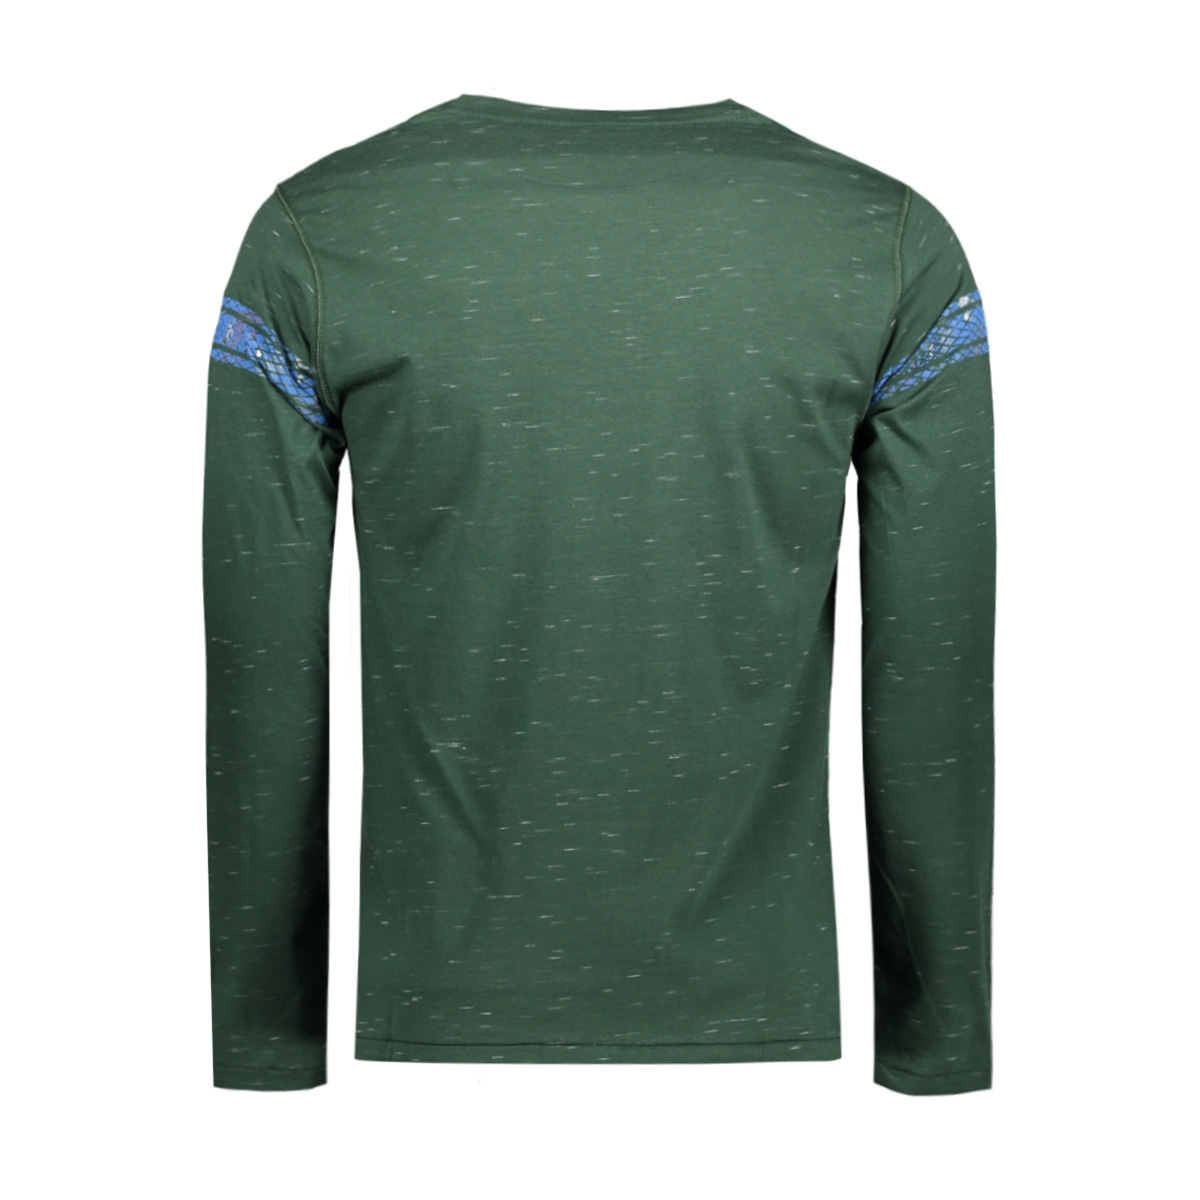 5396 gabbiano t-shirt groen